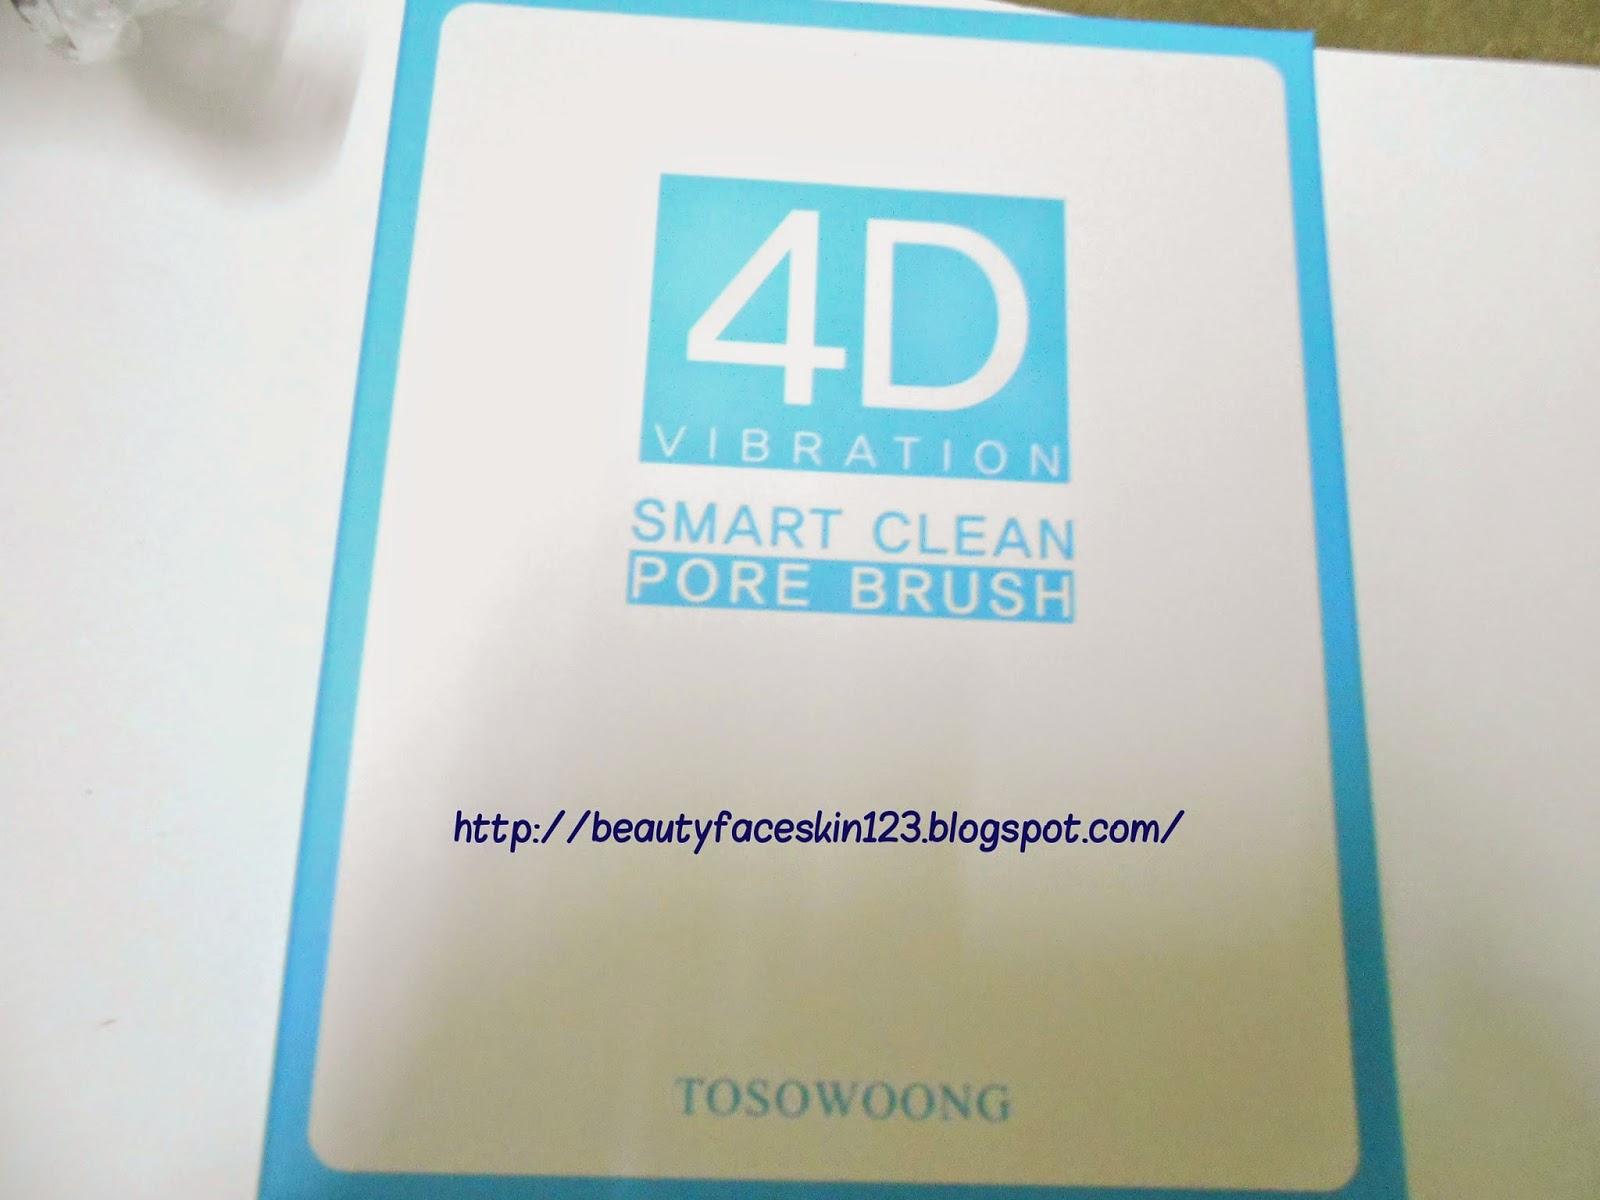 TOSOWOONG 4D VIBRATION PORE BRUSH